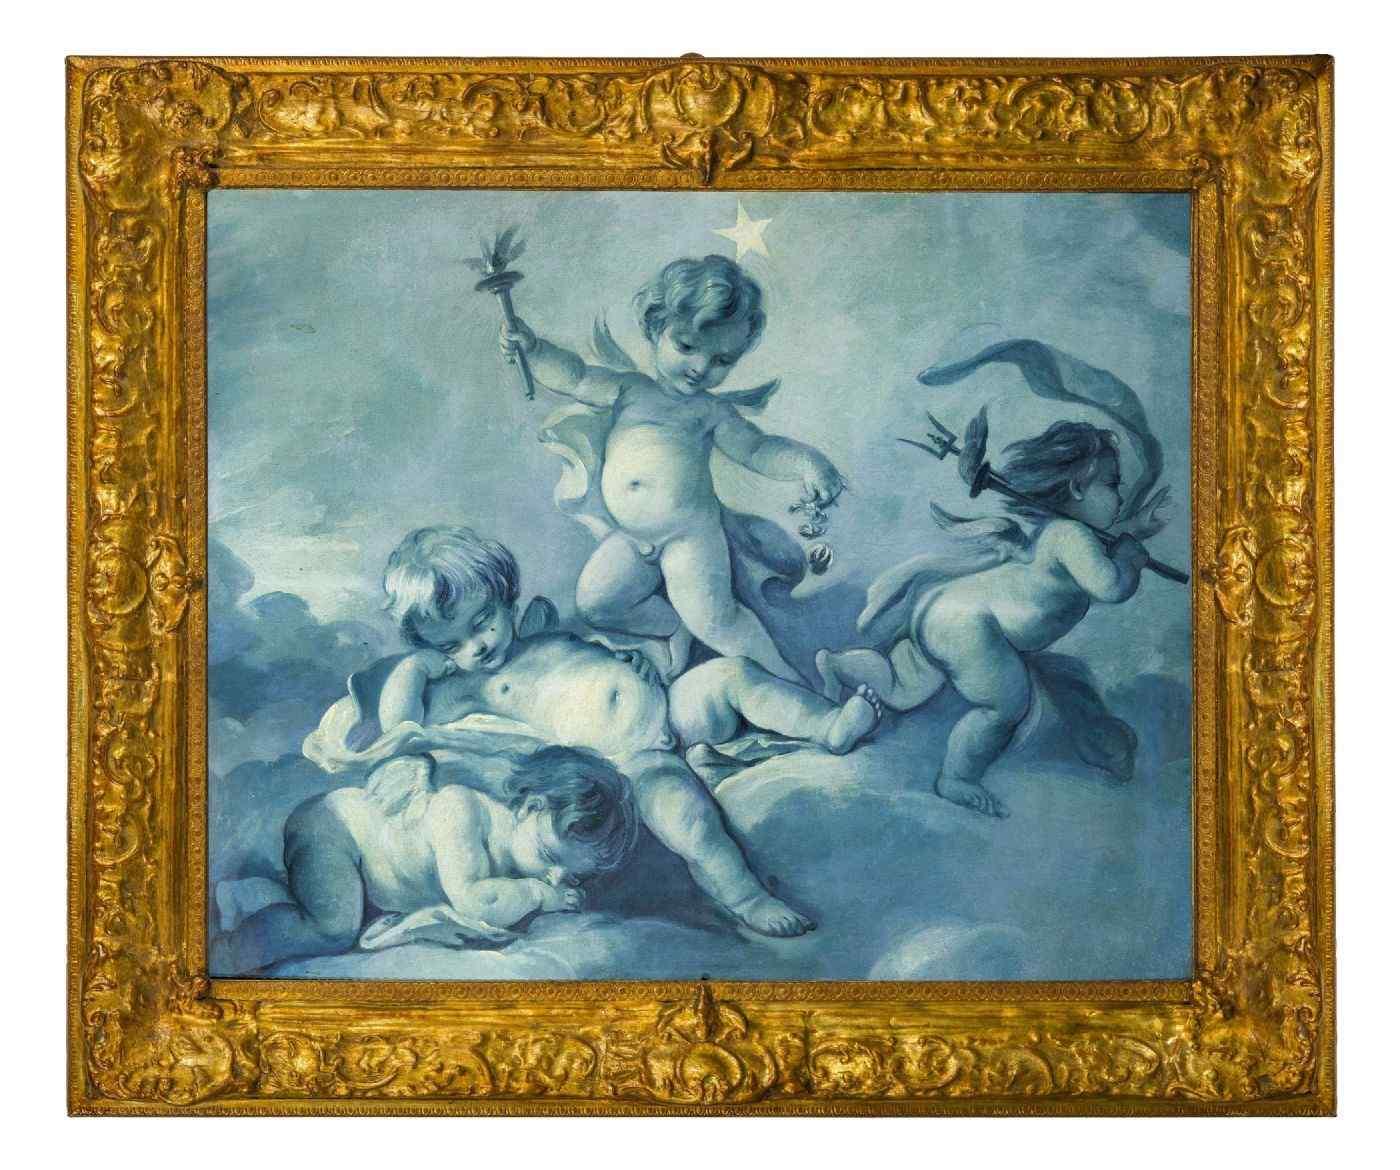 Gruppo di Putti alati, Scuola Francese di Francois Boucher